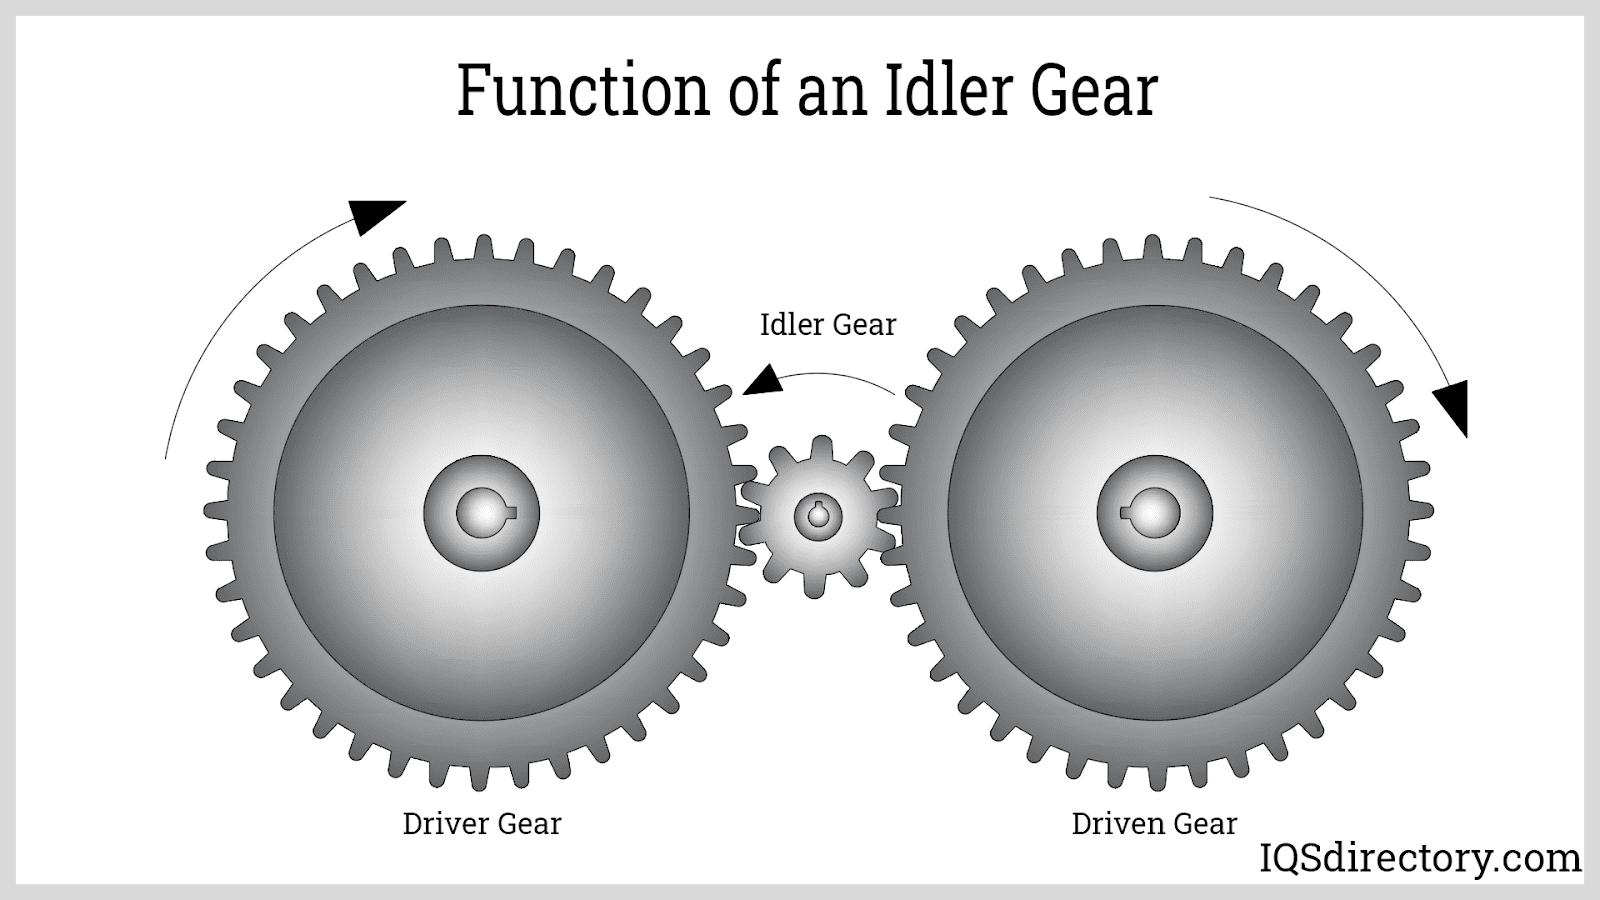 Function of an Idler Gear